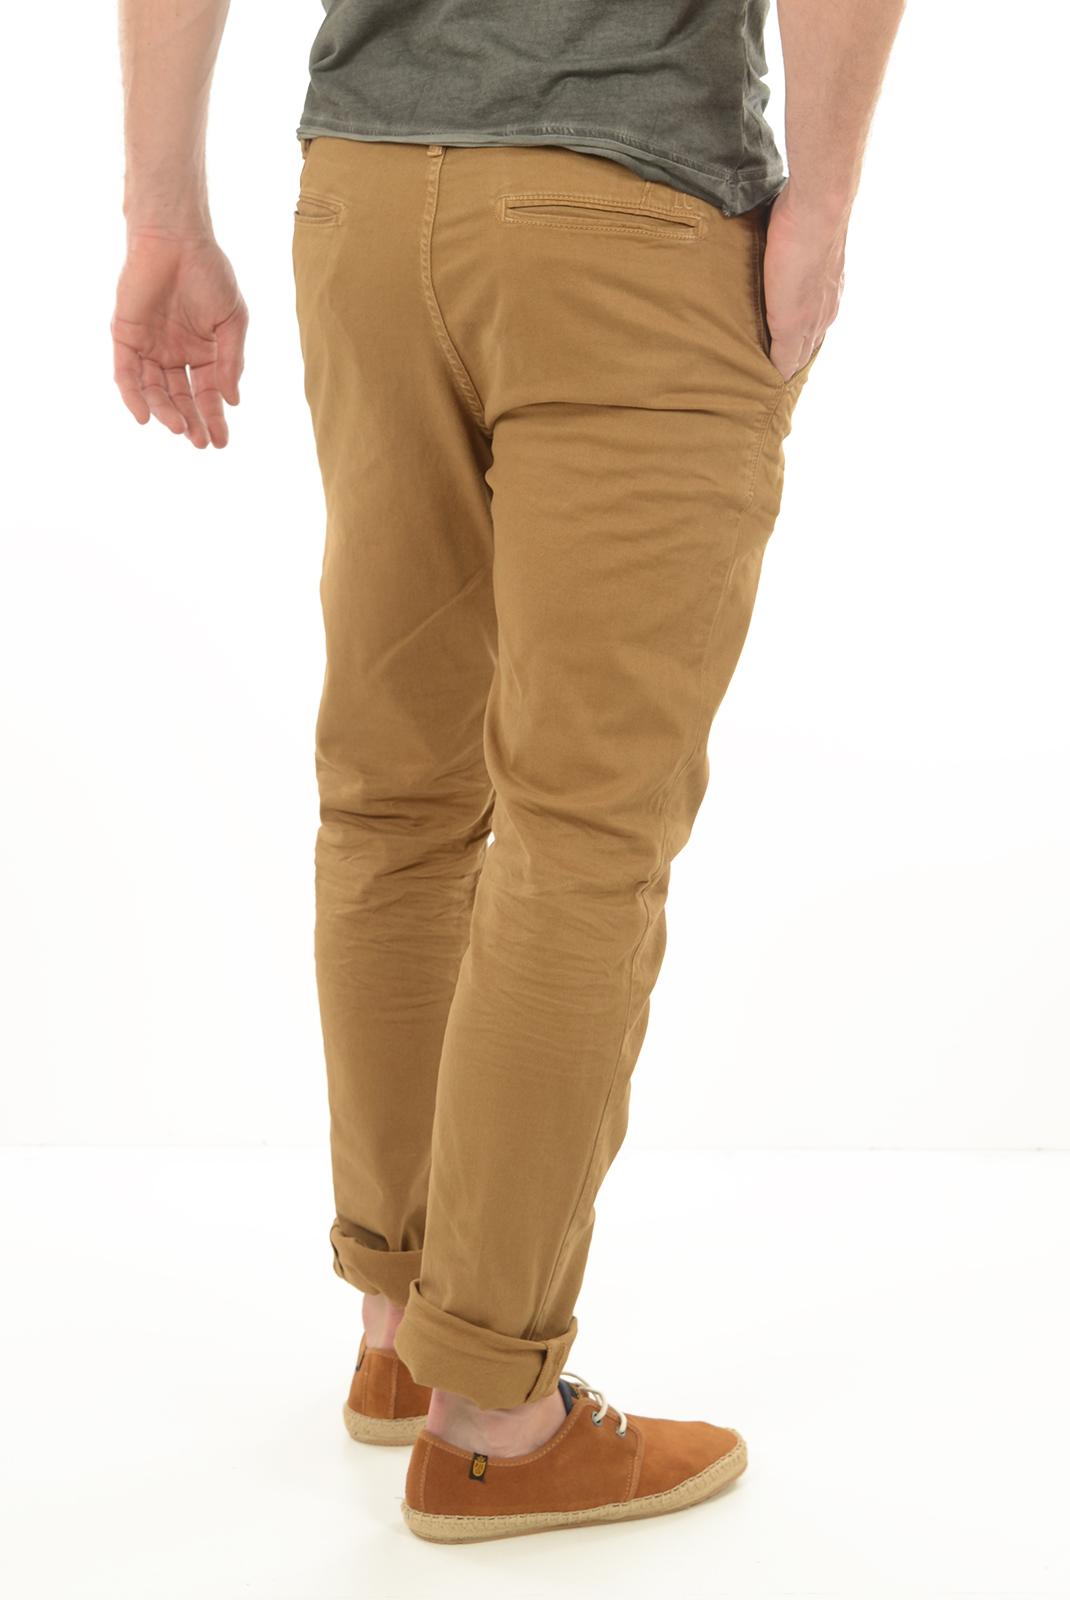 Pantalons chino/citadin  Lee cooper GARVEN 7634 CAMEL